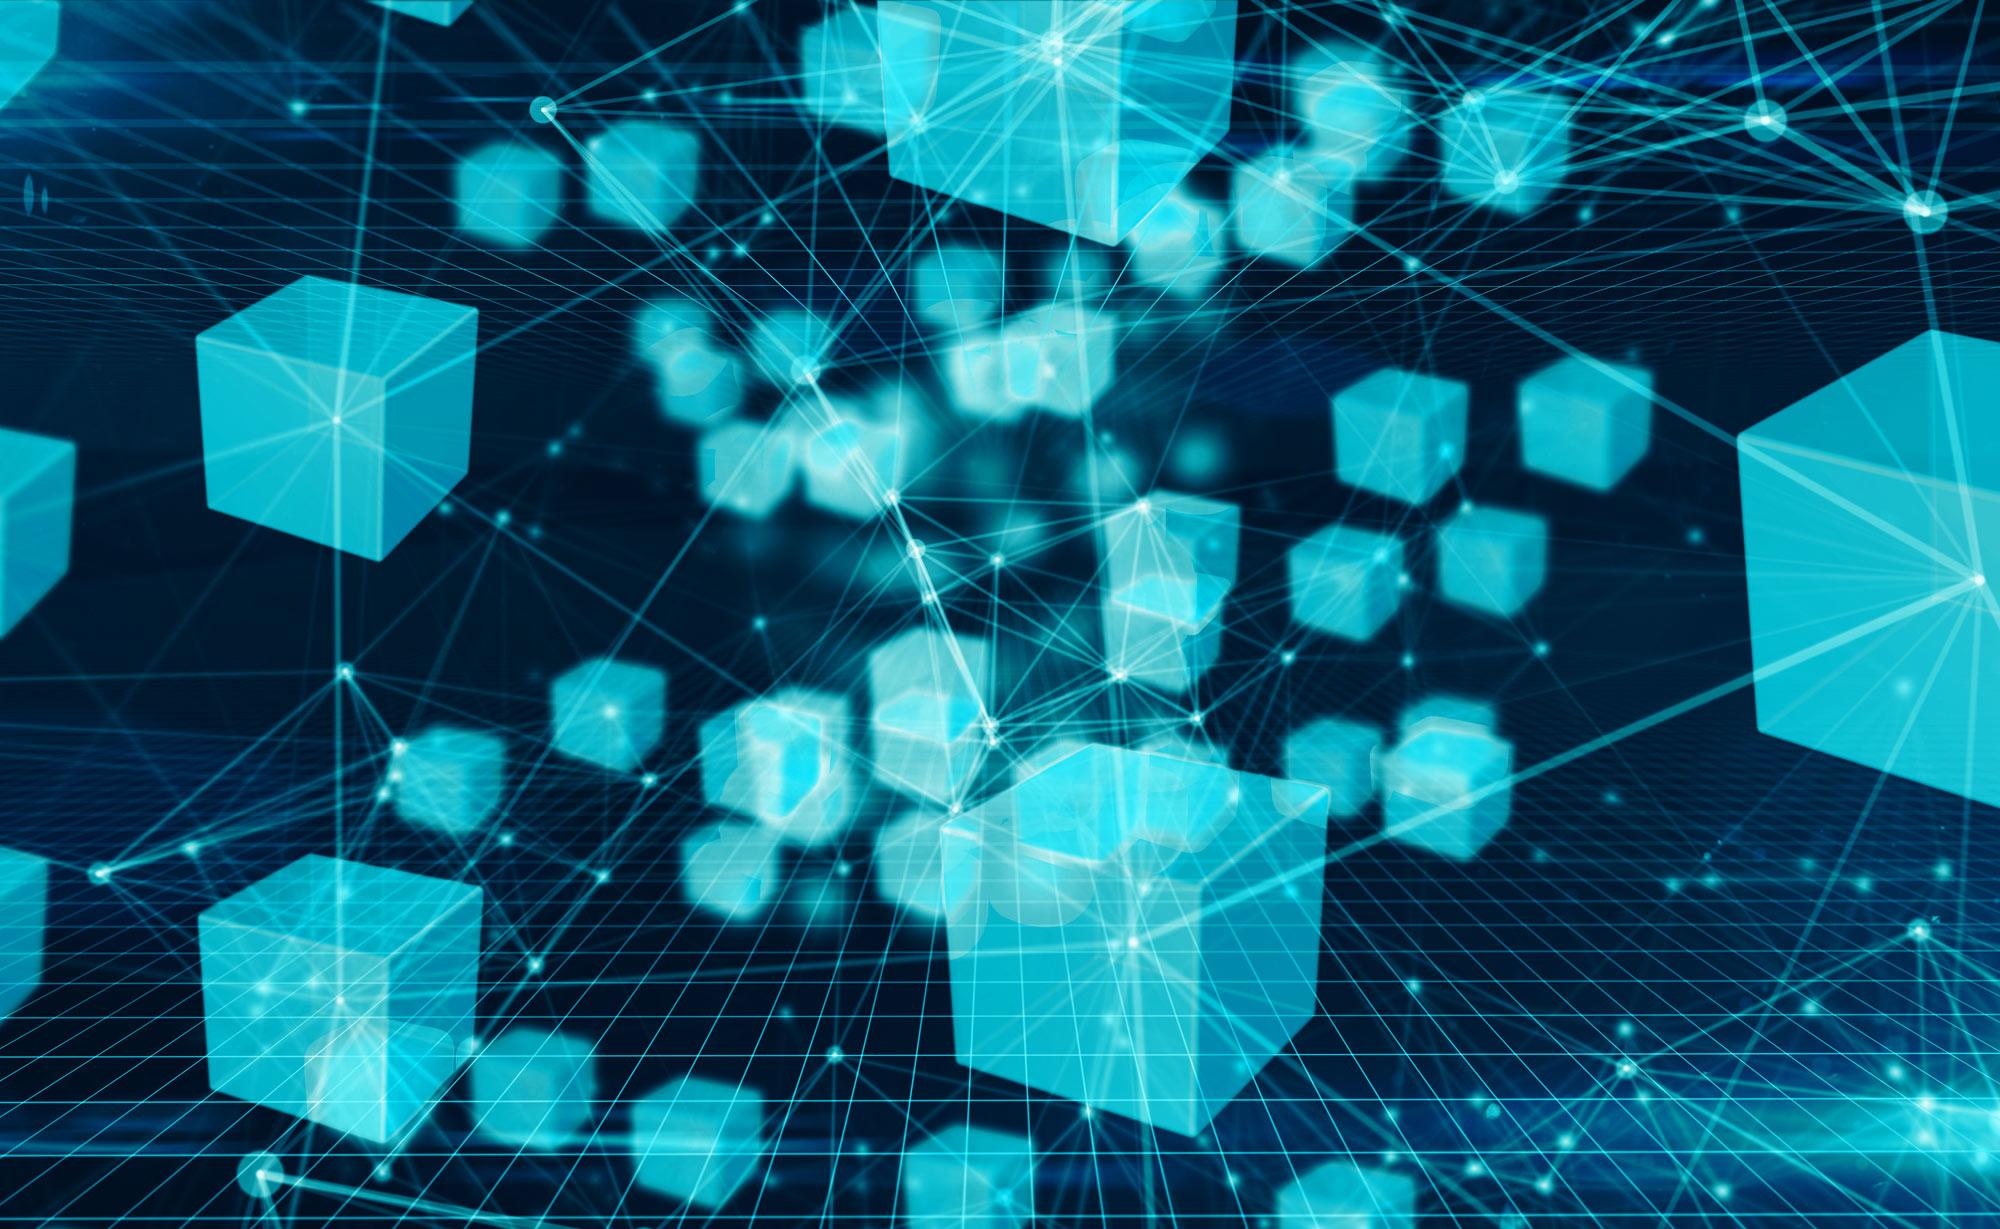 Israeli Exchange TASE Partners with Blockchain Technology Partners